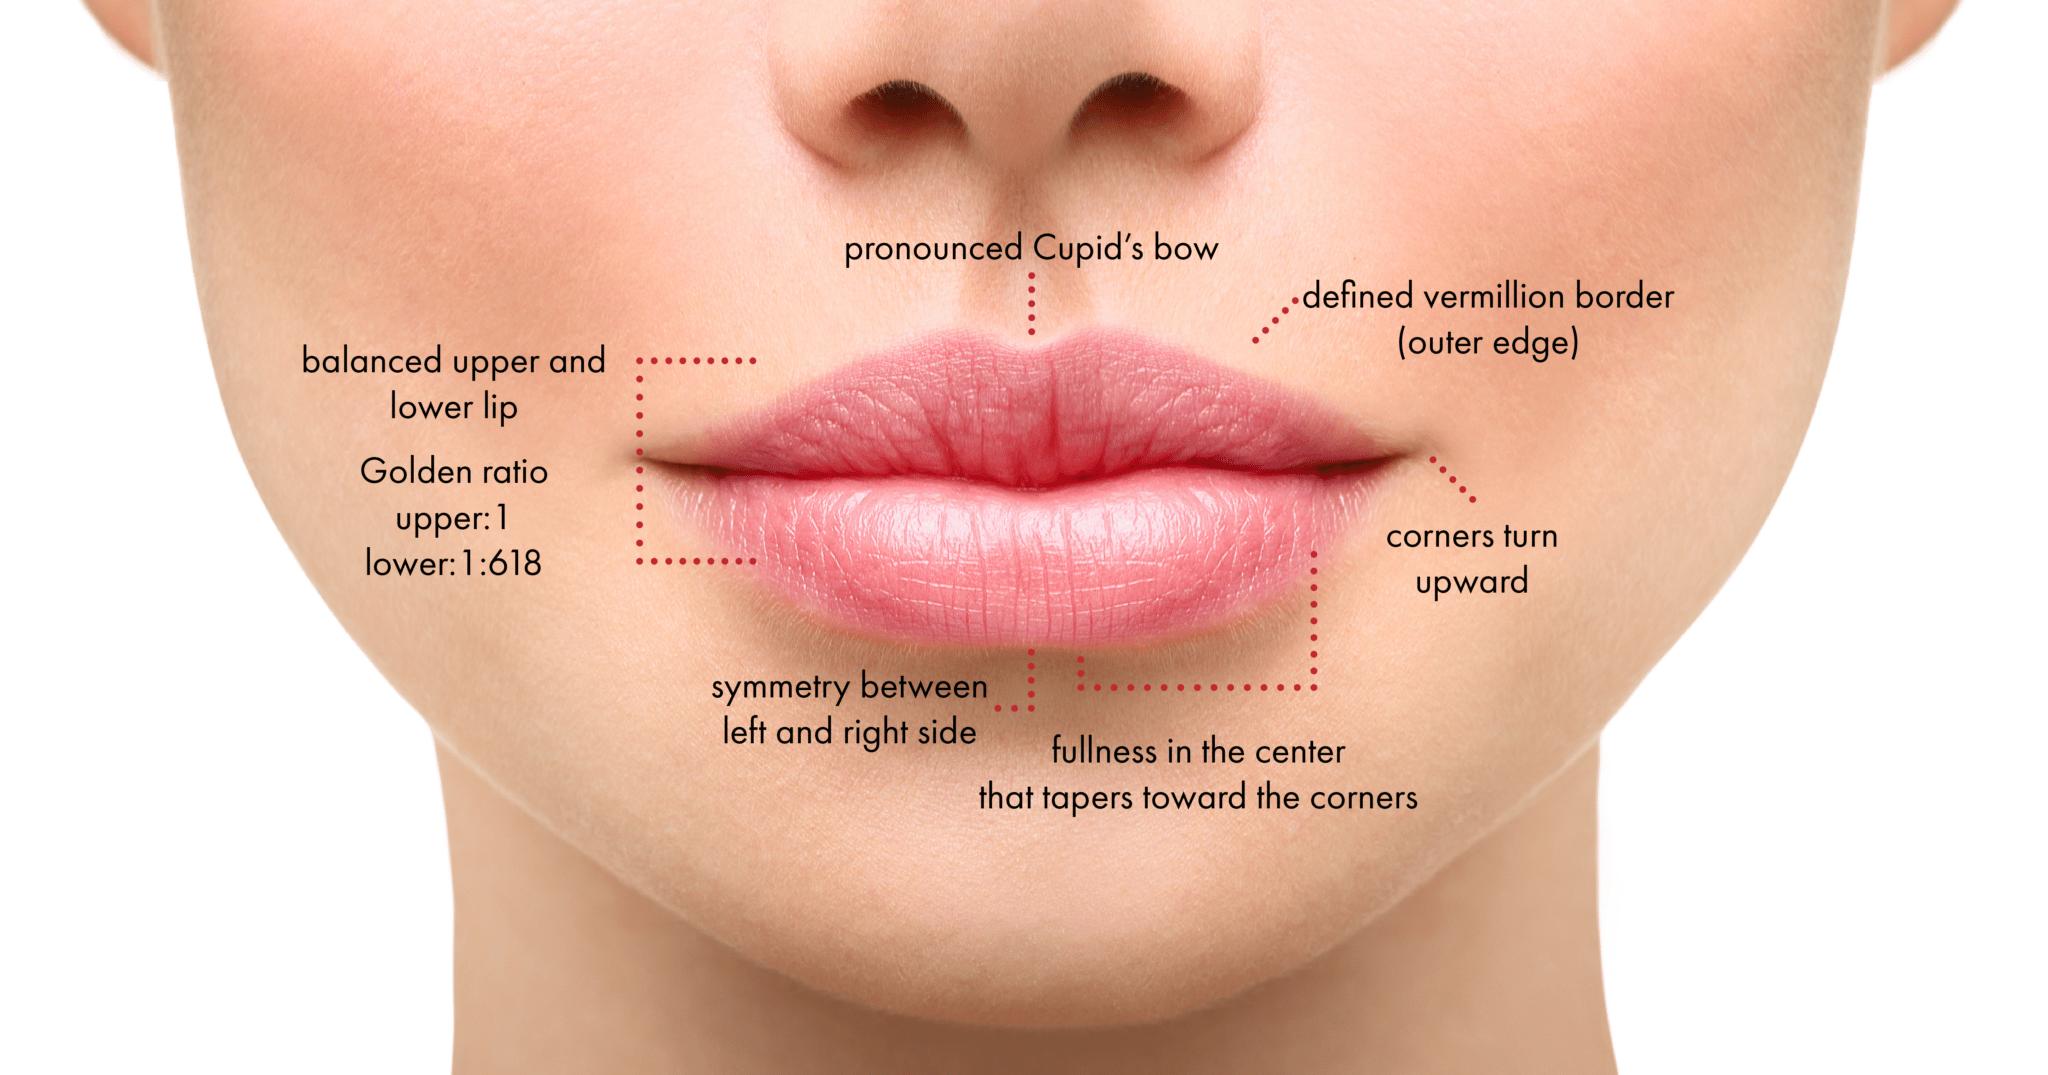 lip filler augmentation diagram in new york